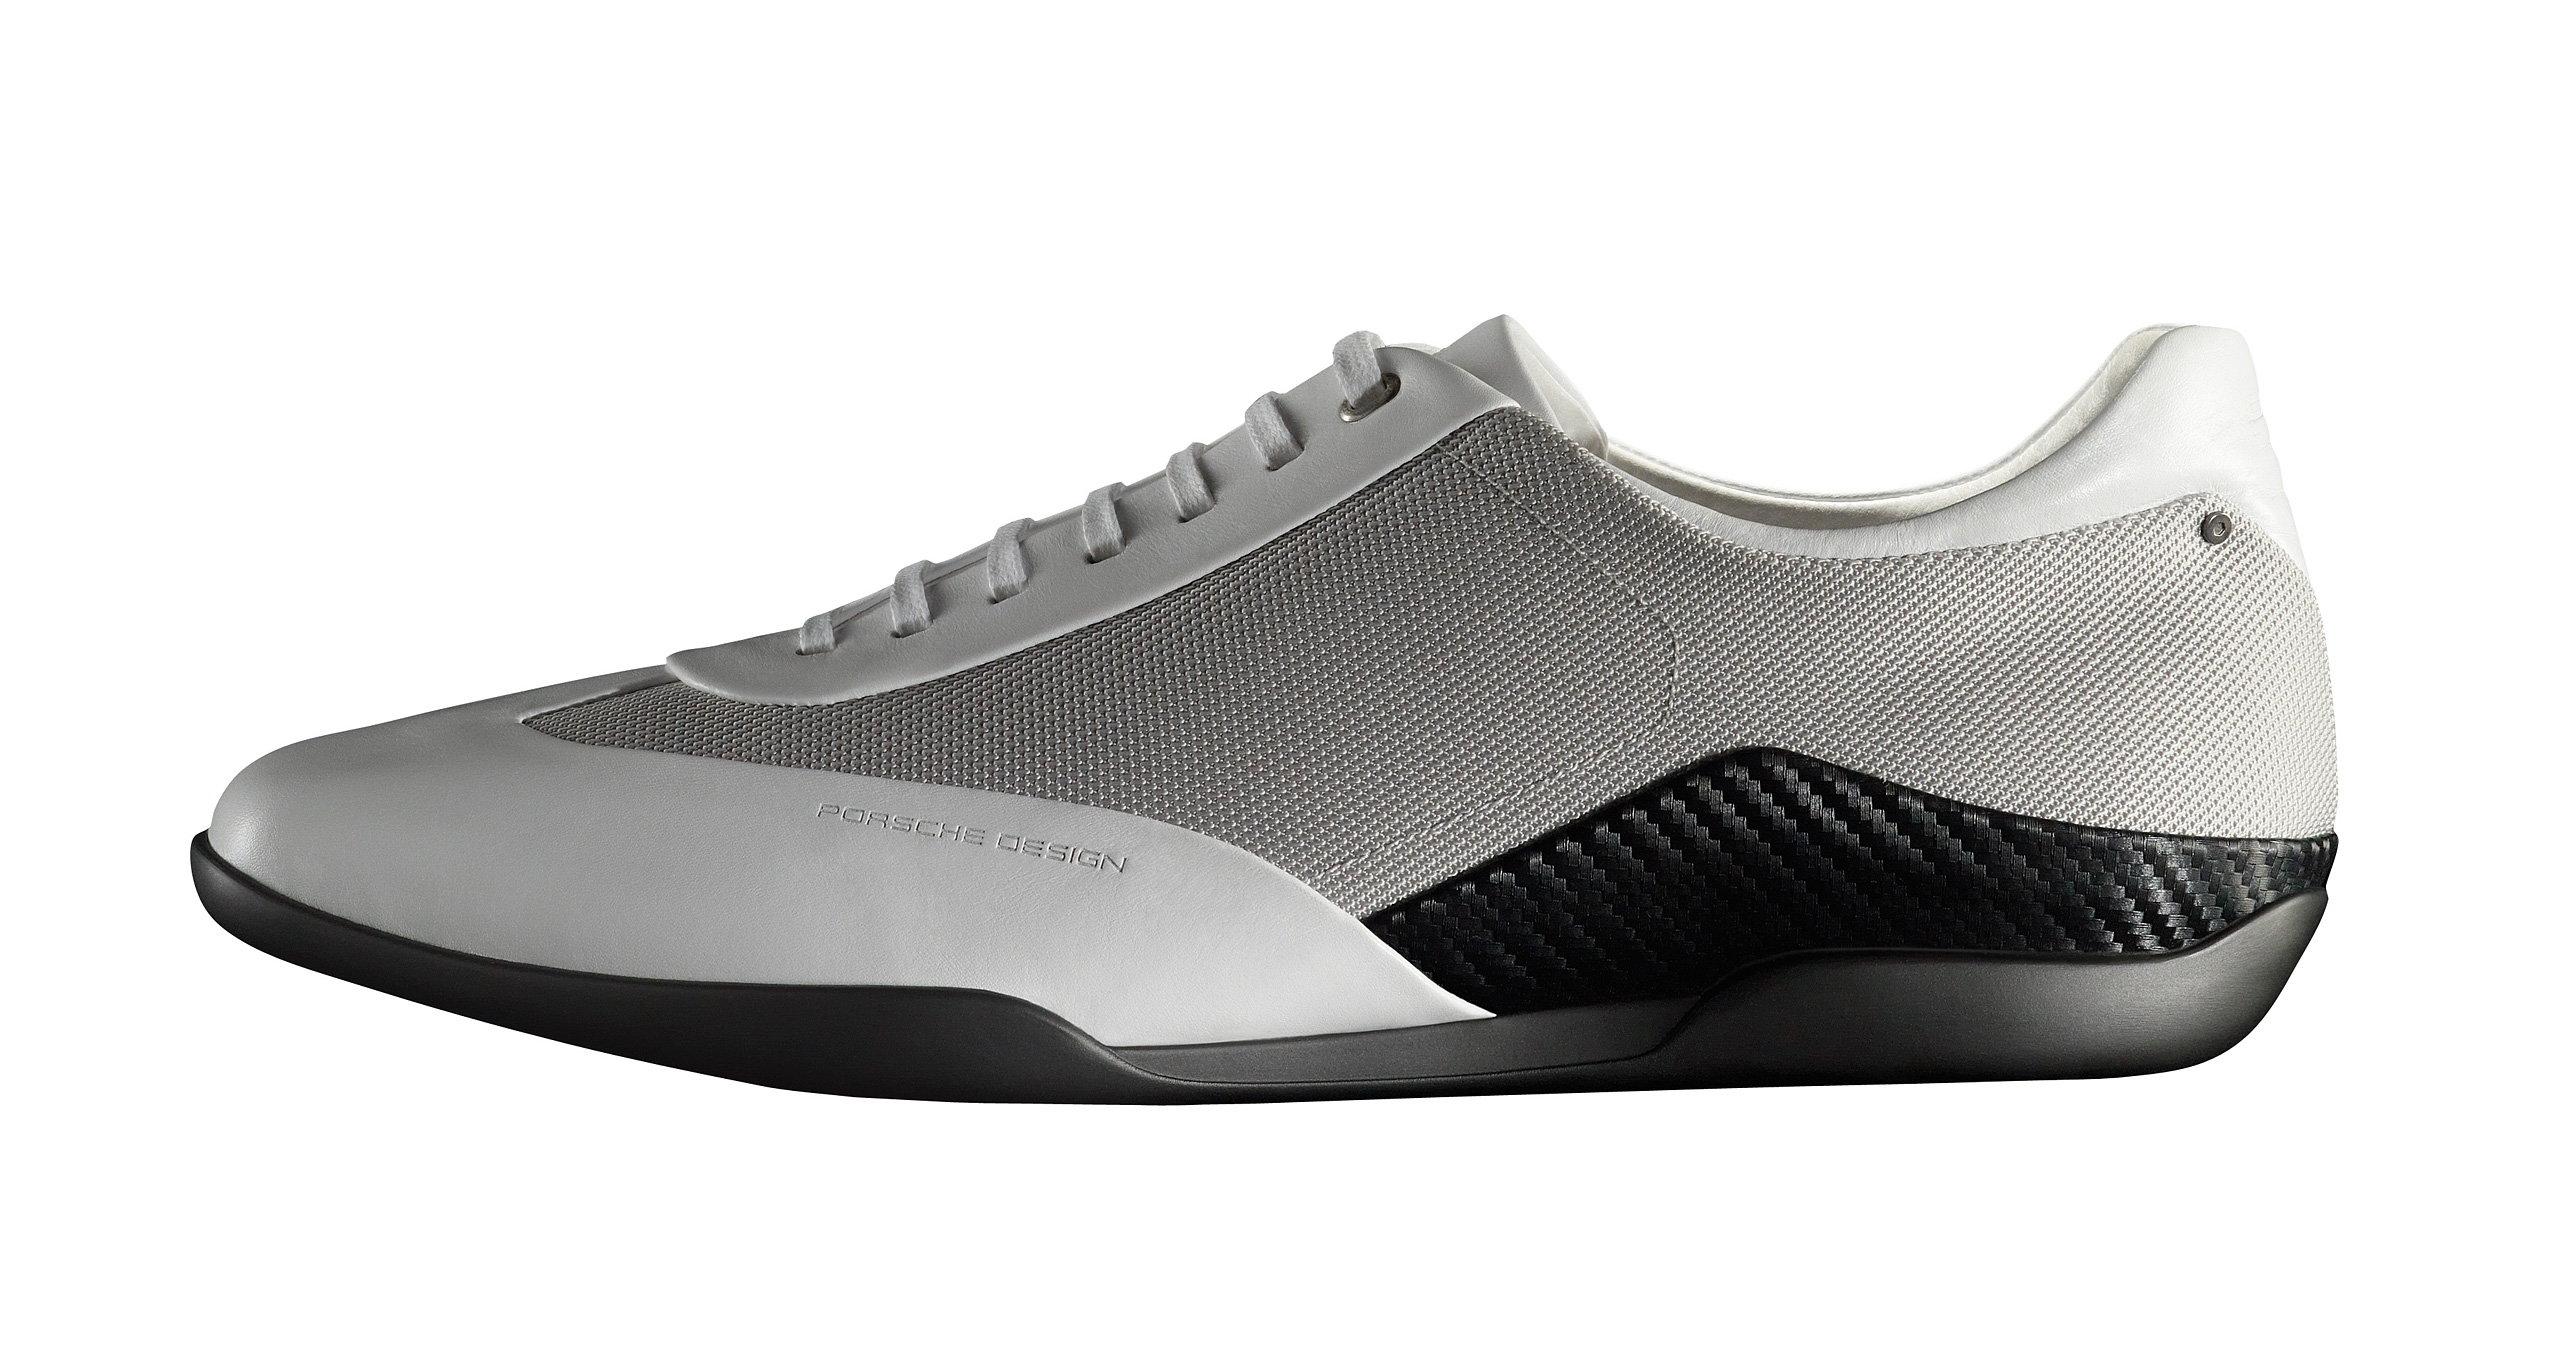 Men's Shoes From Porsche Design